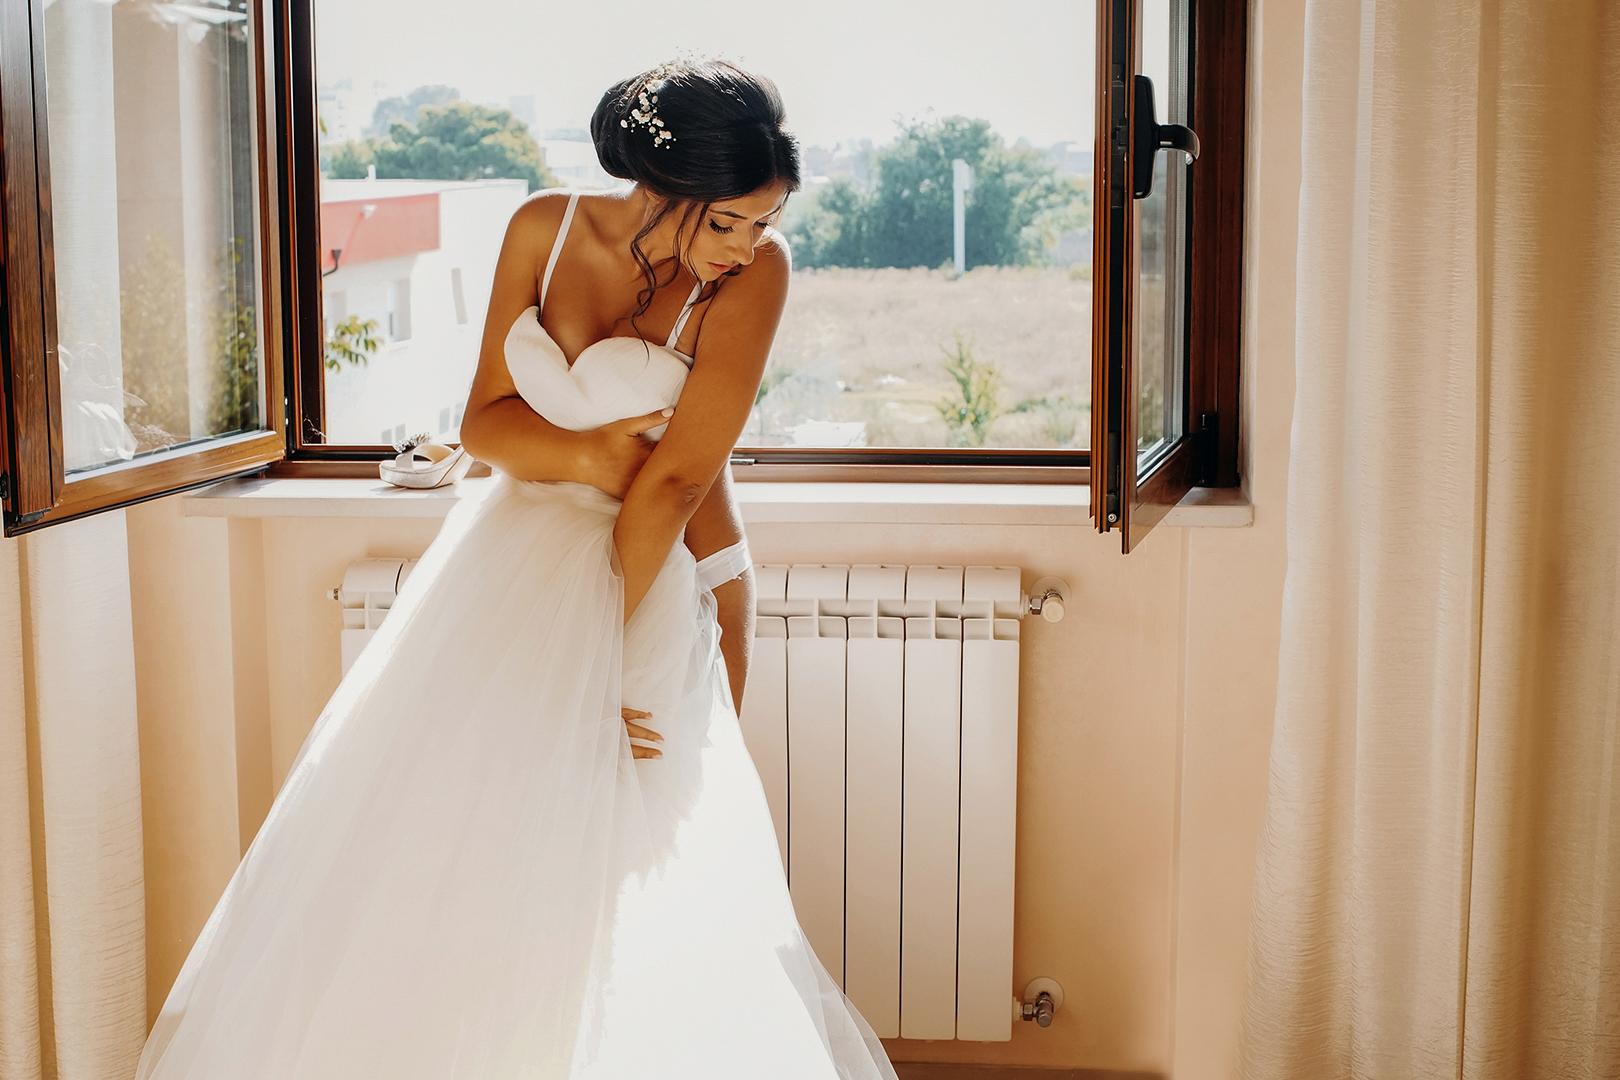 18 gianni-lepore-sposa-vestito